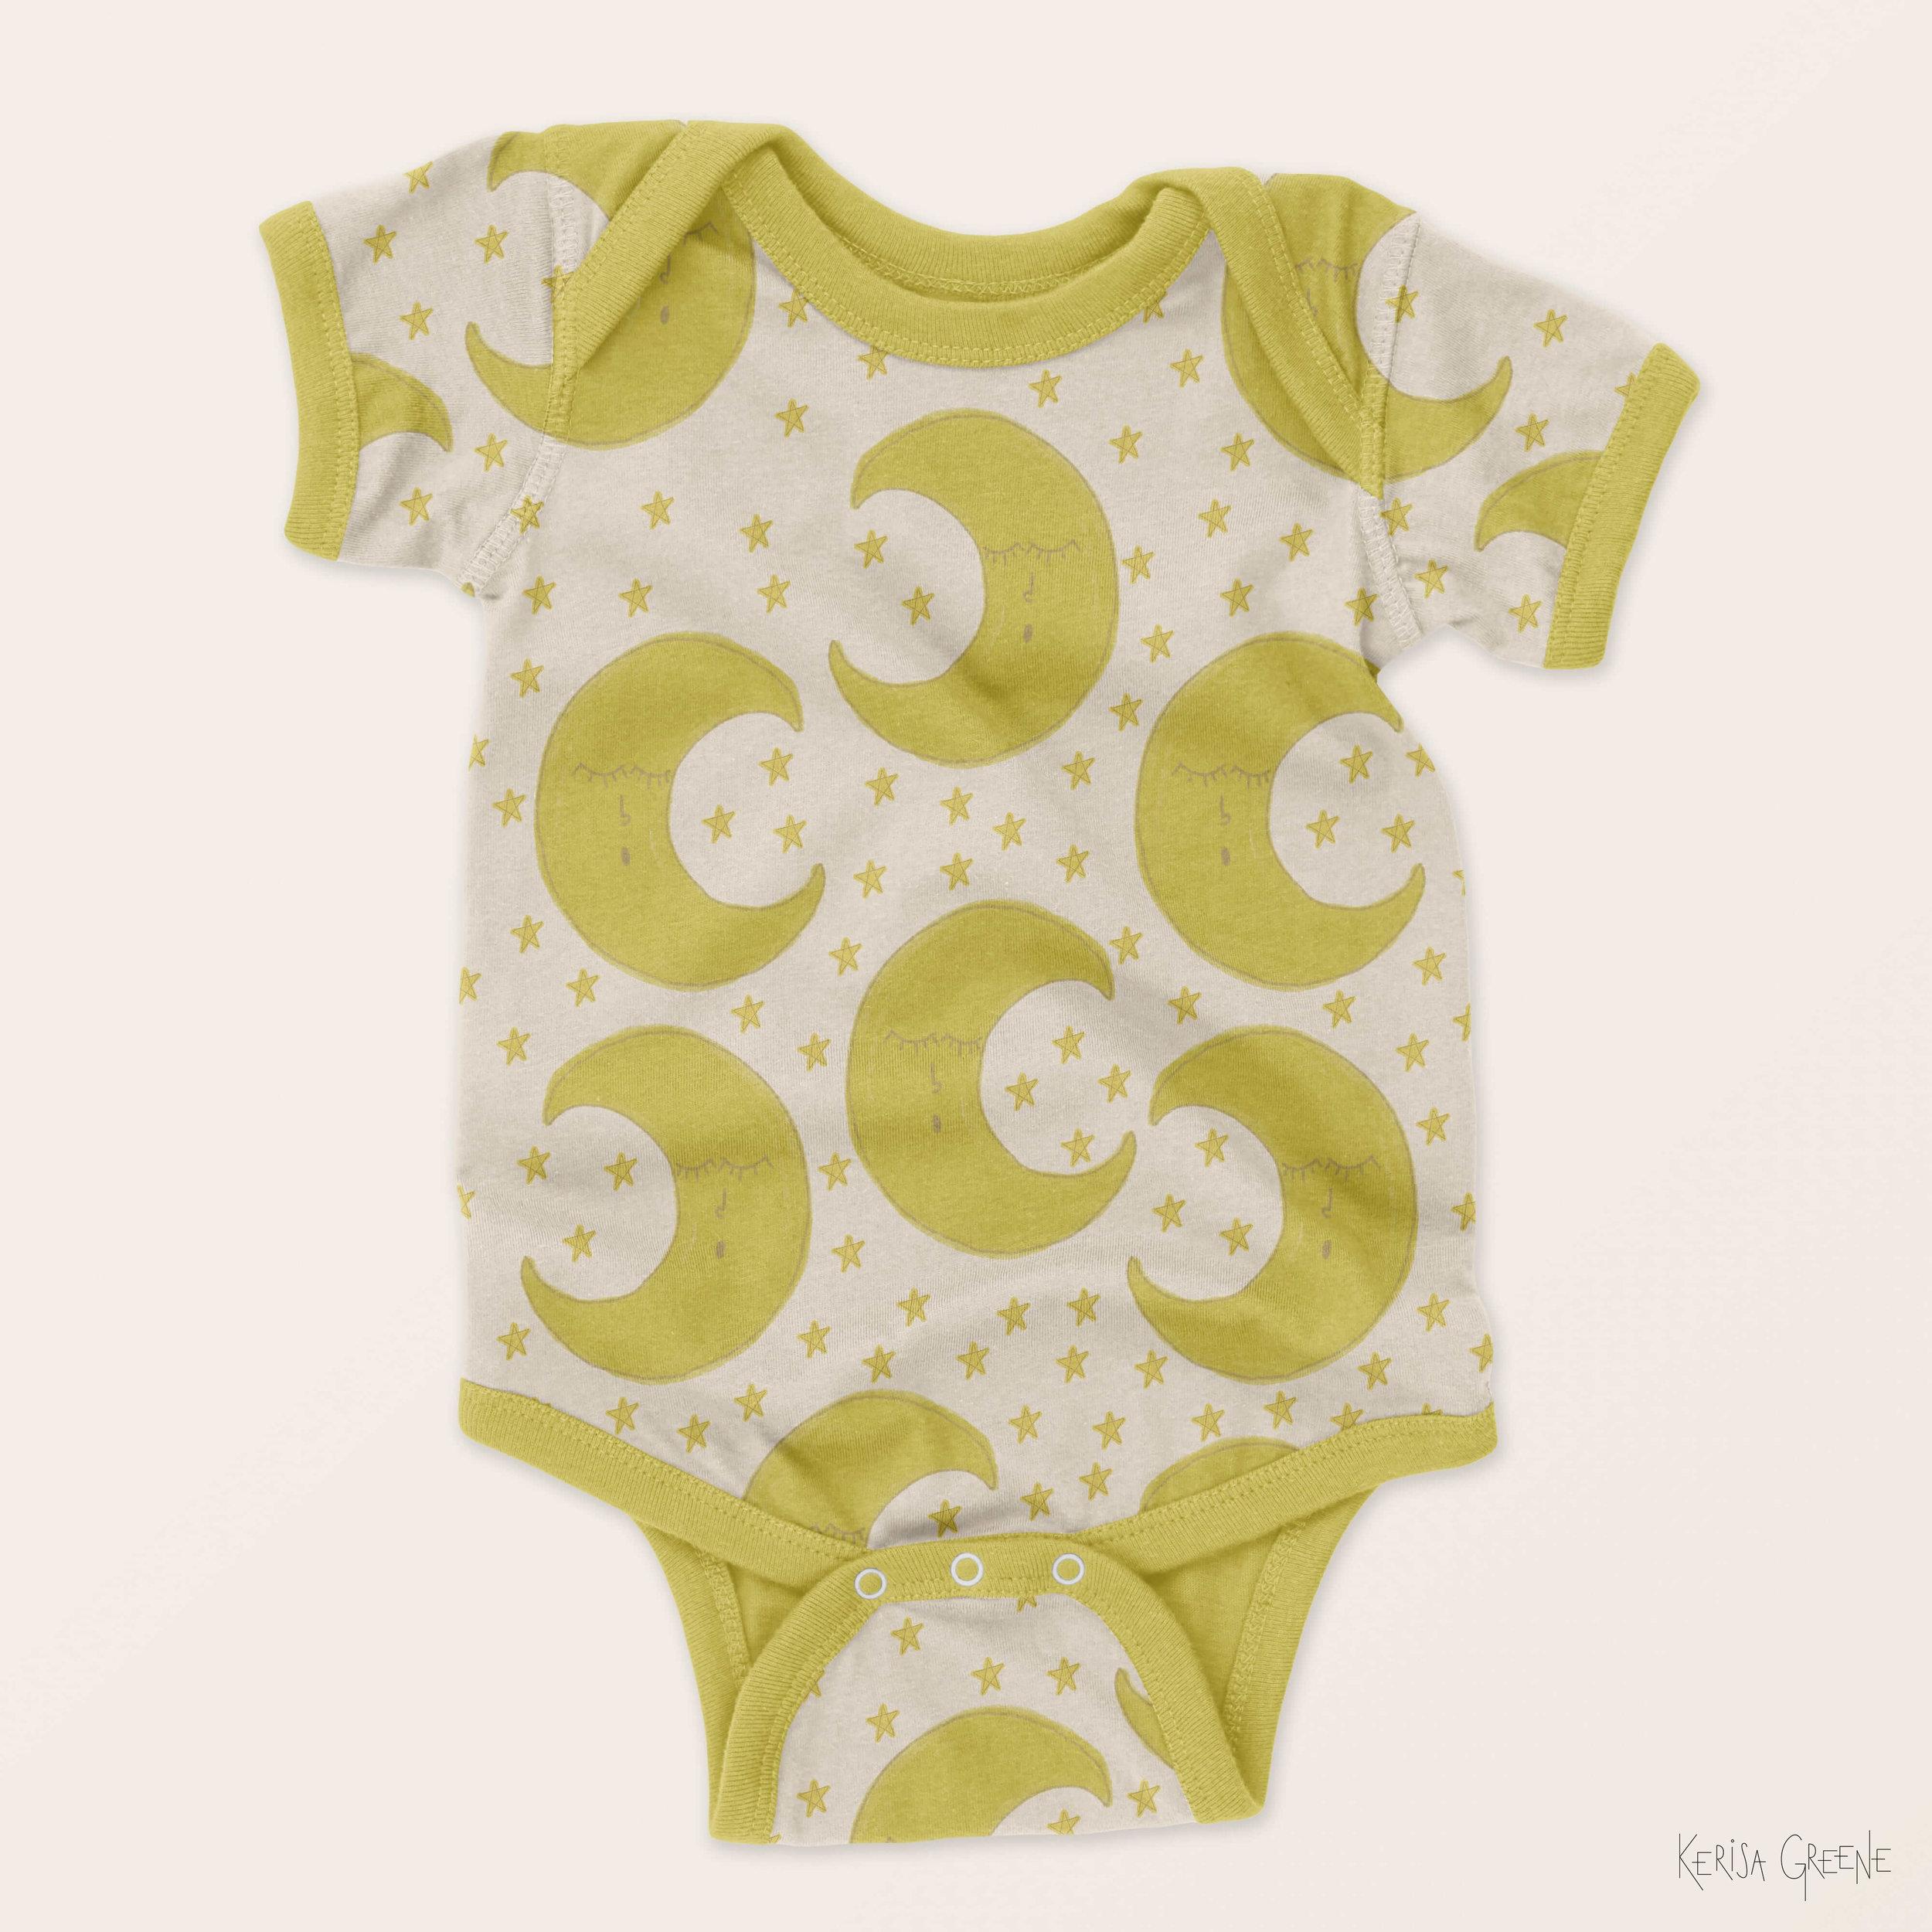 Kerisa Greene Illustration Kids Baby Surface Pattern Design Cute Sleeping Moon and Stars